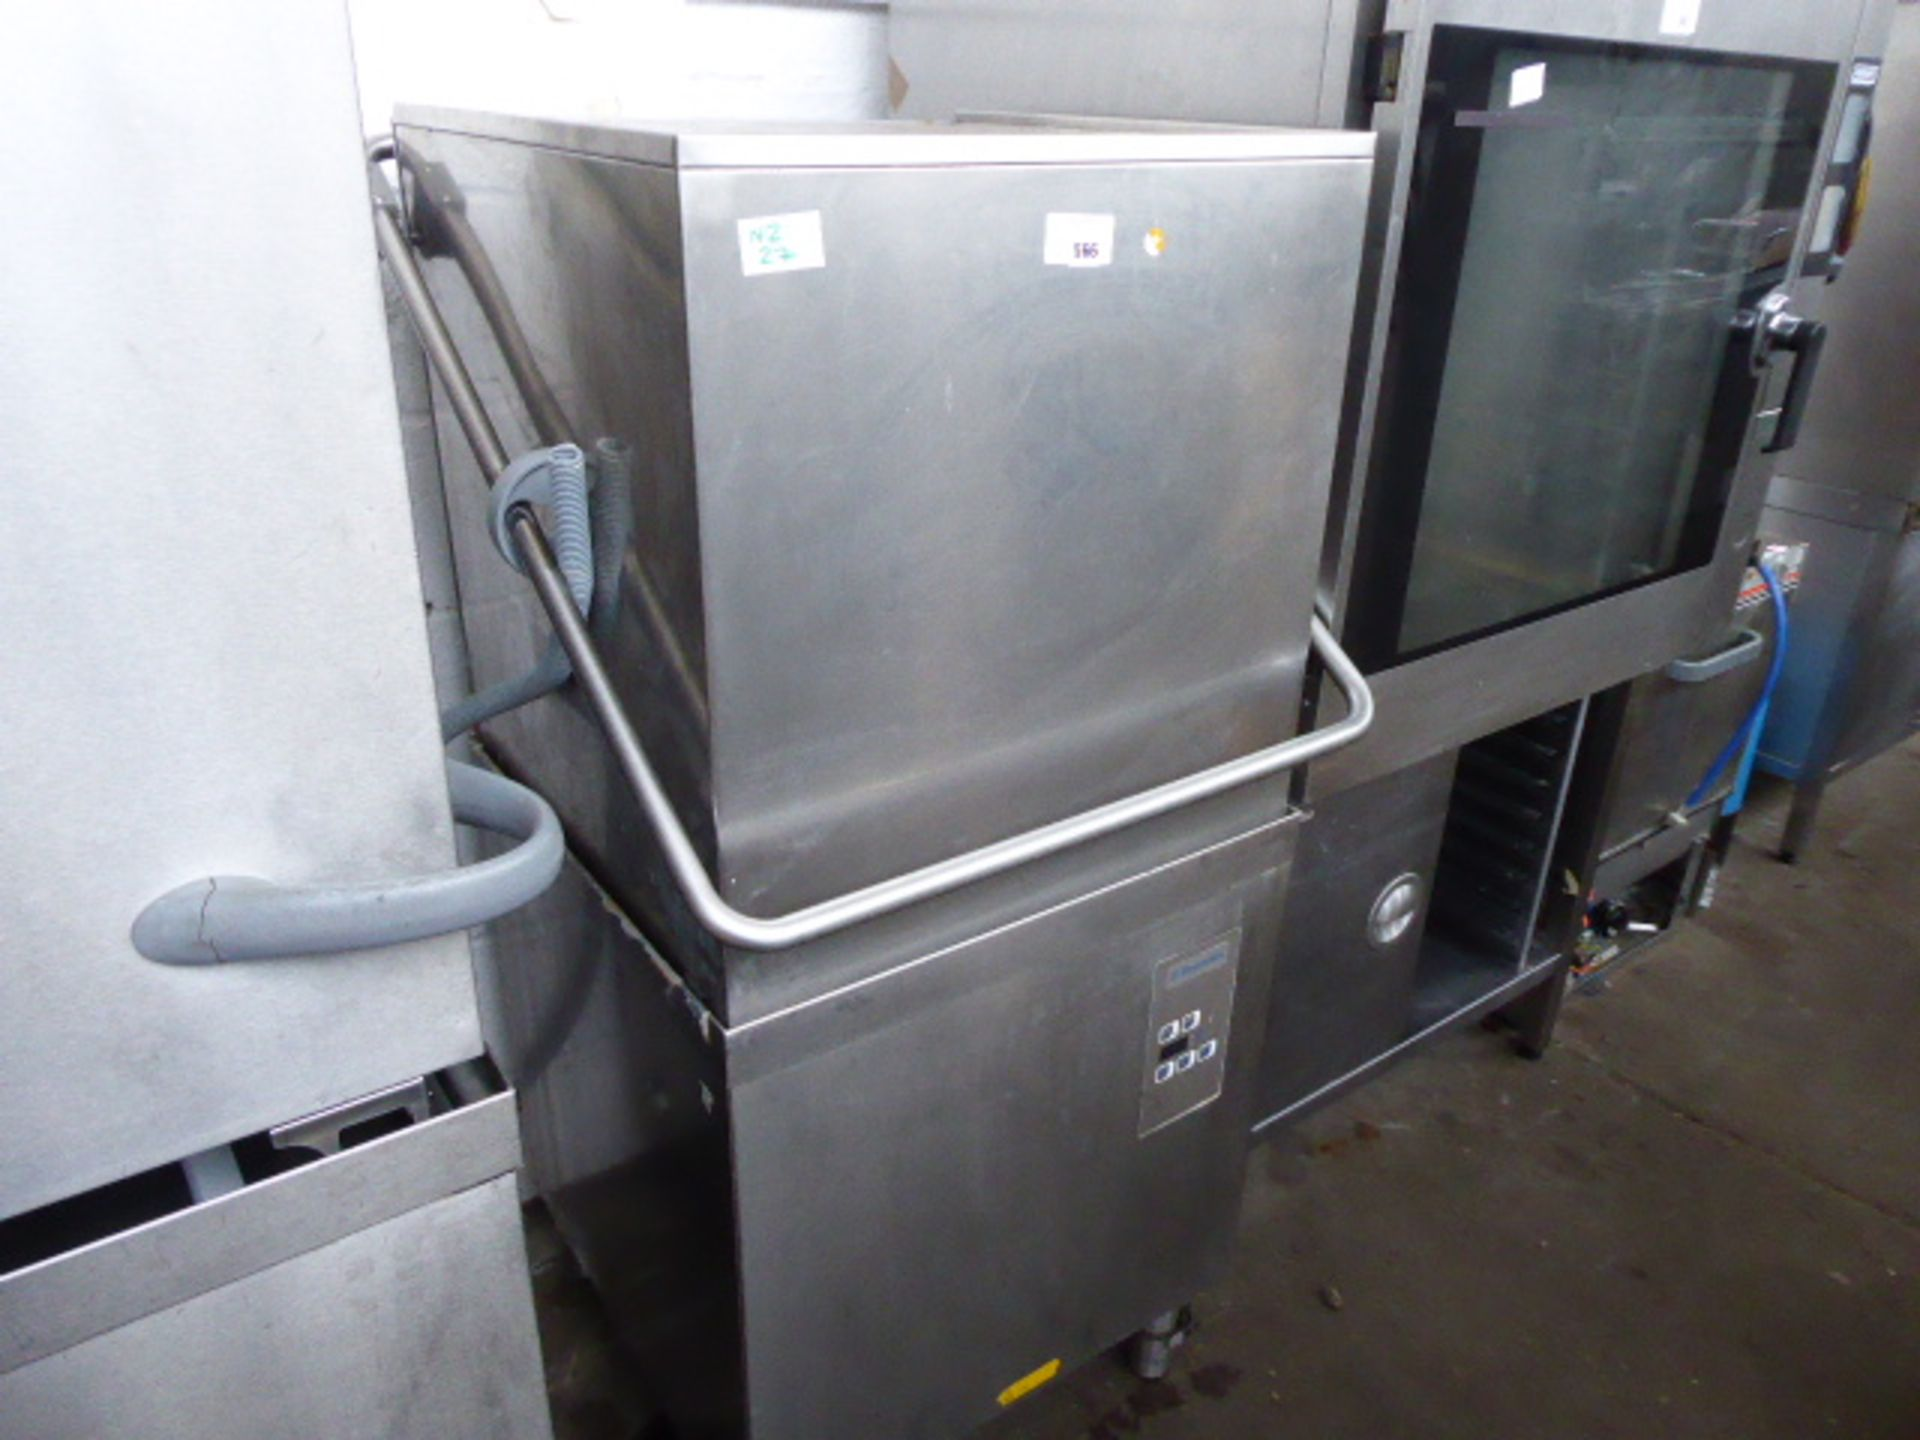 Lot 566 - 65cm Electrolux lift top pass through dishwasher